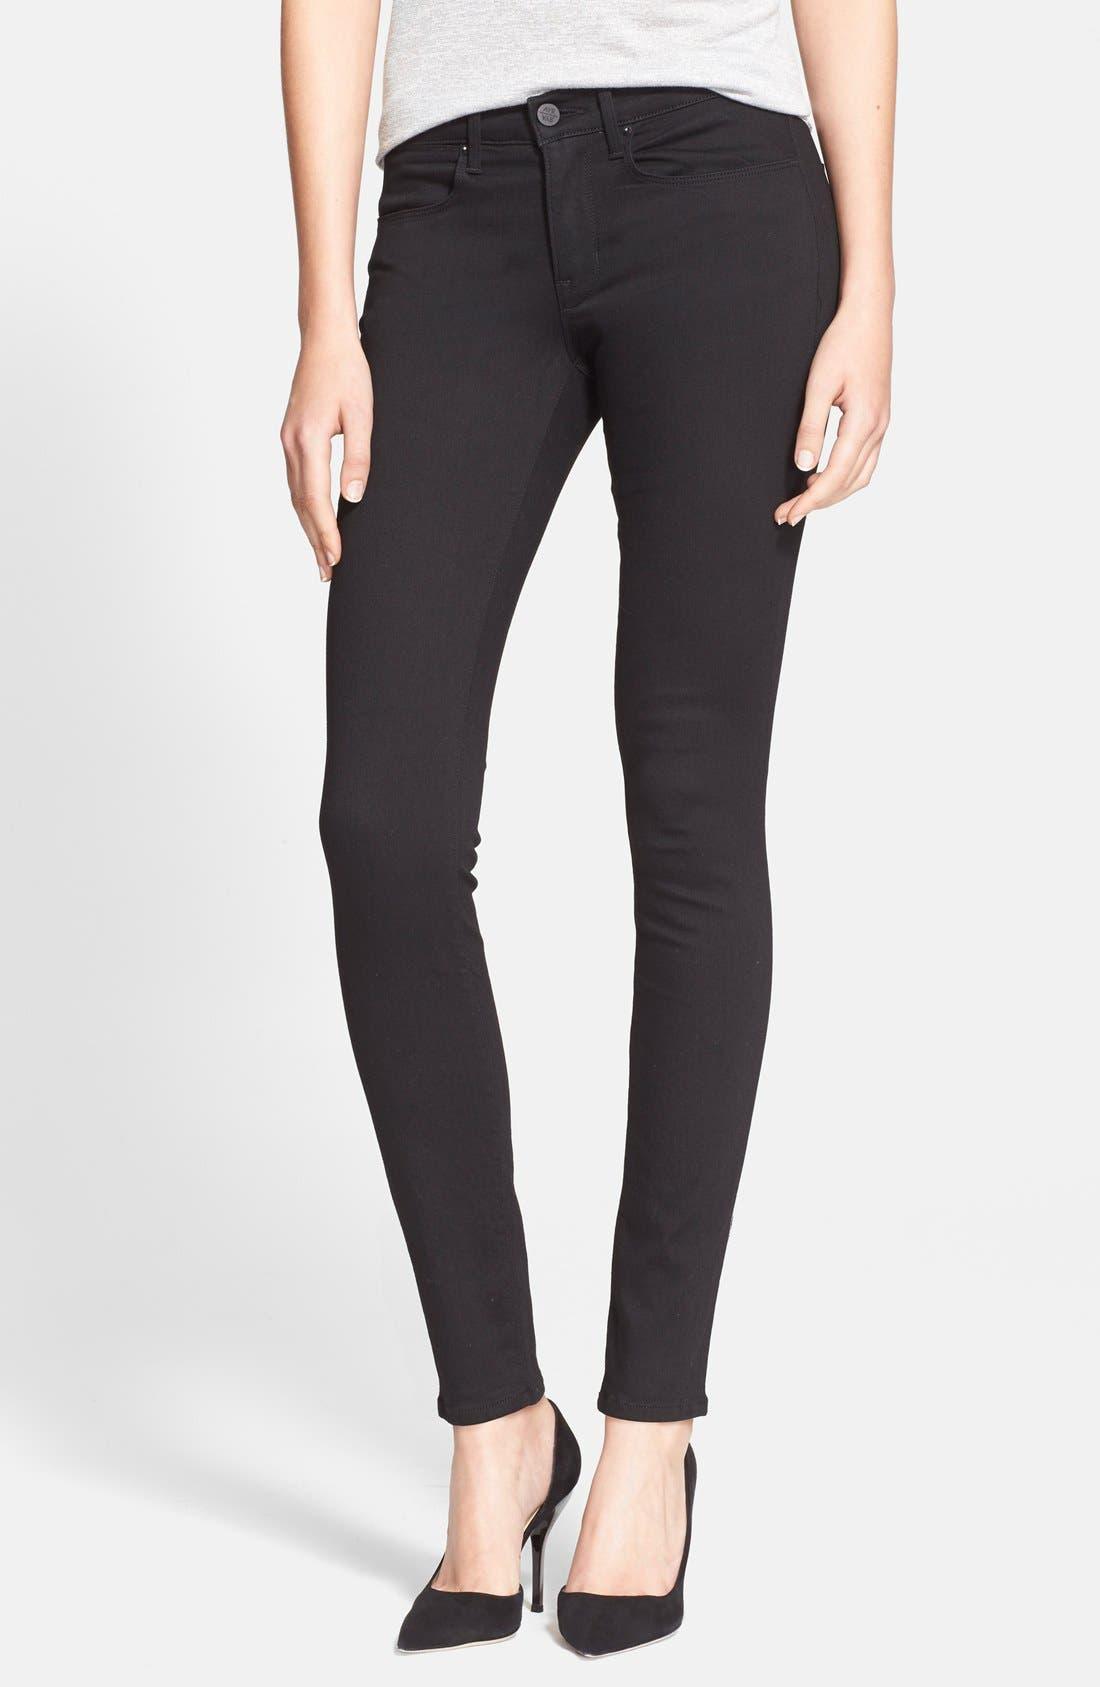 Main Image - AYR 'The Skinny' Skinny Jeans (Jet Black)